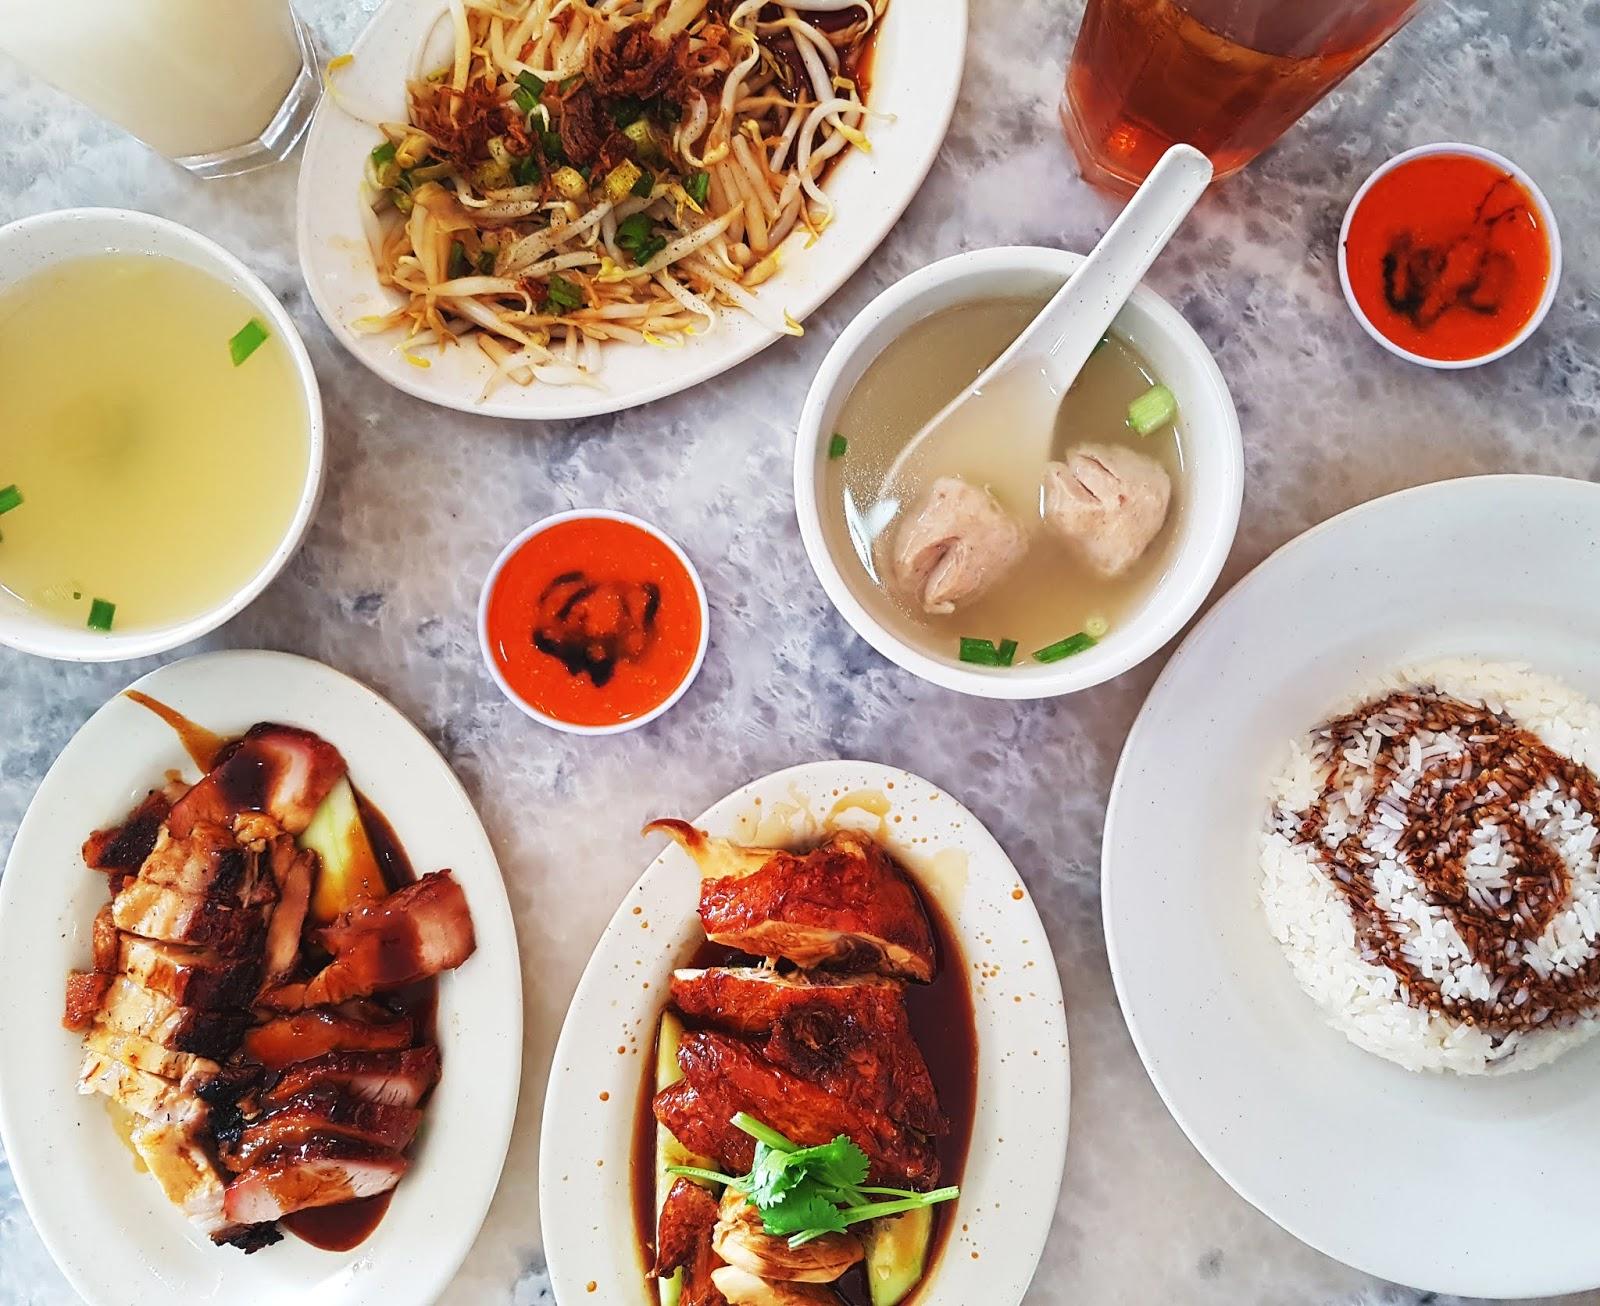 Restoran Lau Wong Kei Chicken Rice Bukit Tinggi 2 Klang